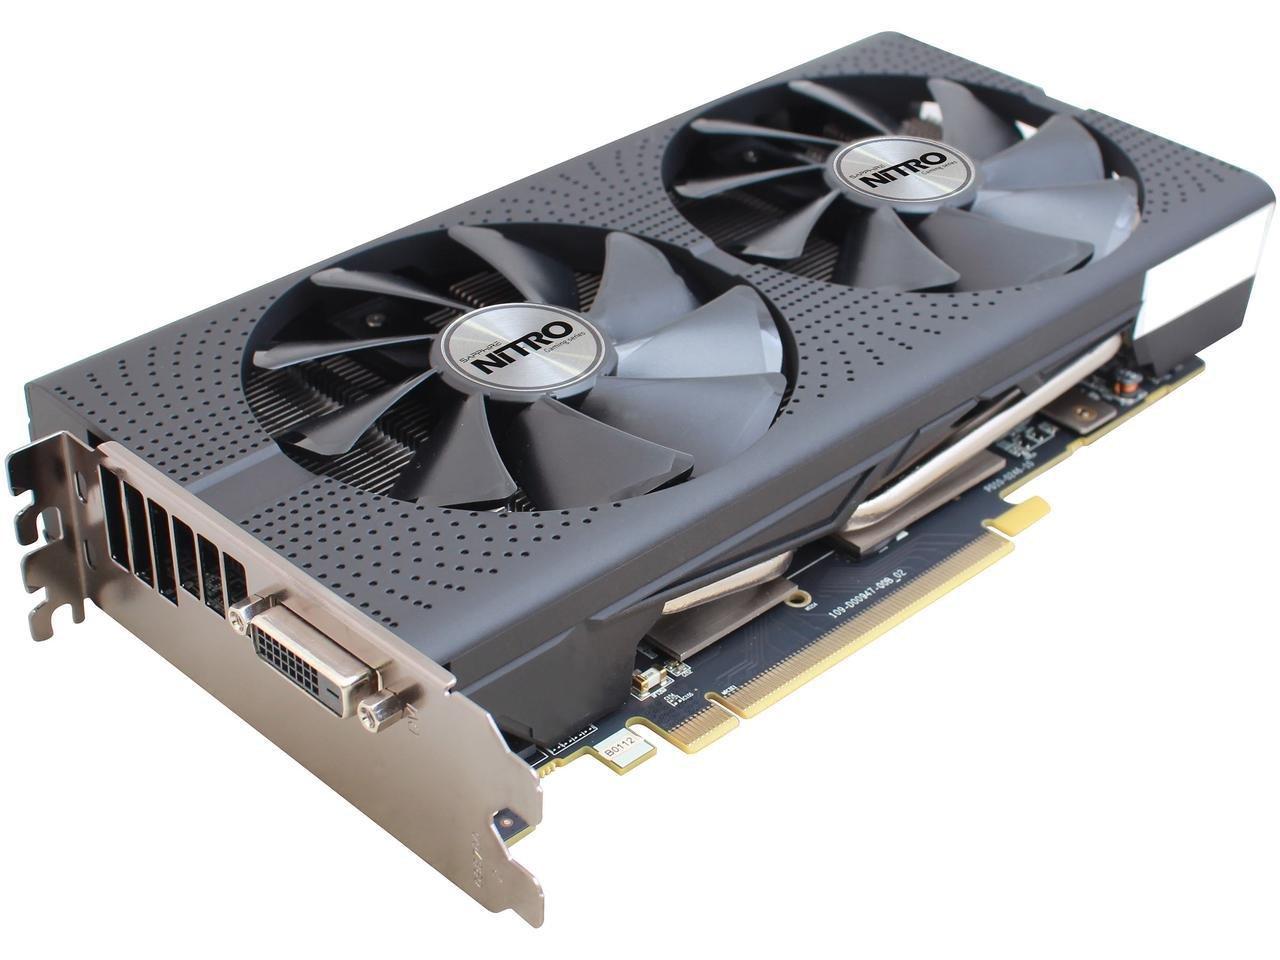 Sapphire Radeon RX 470 MINING Edition 8192MB GDDR5 PCI-Express Graphics Card